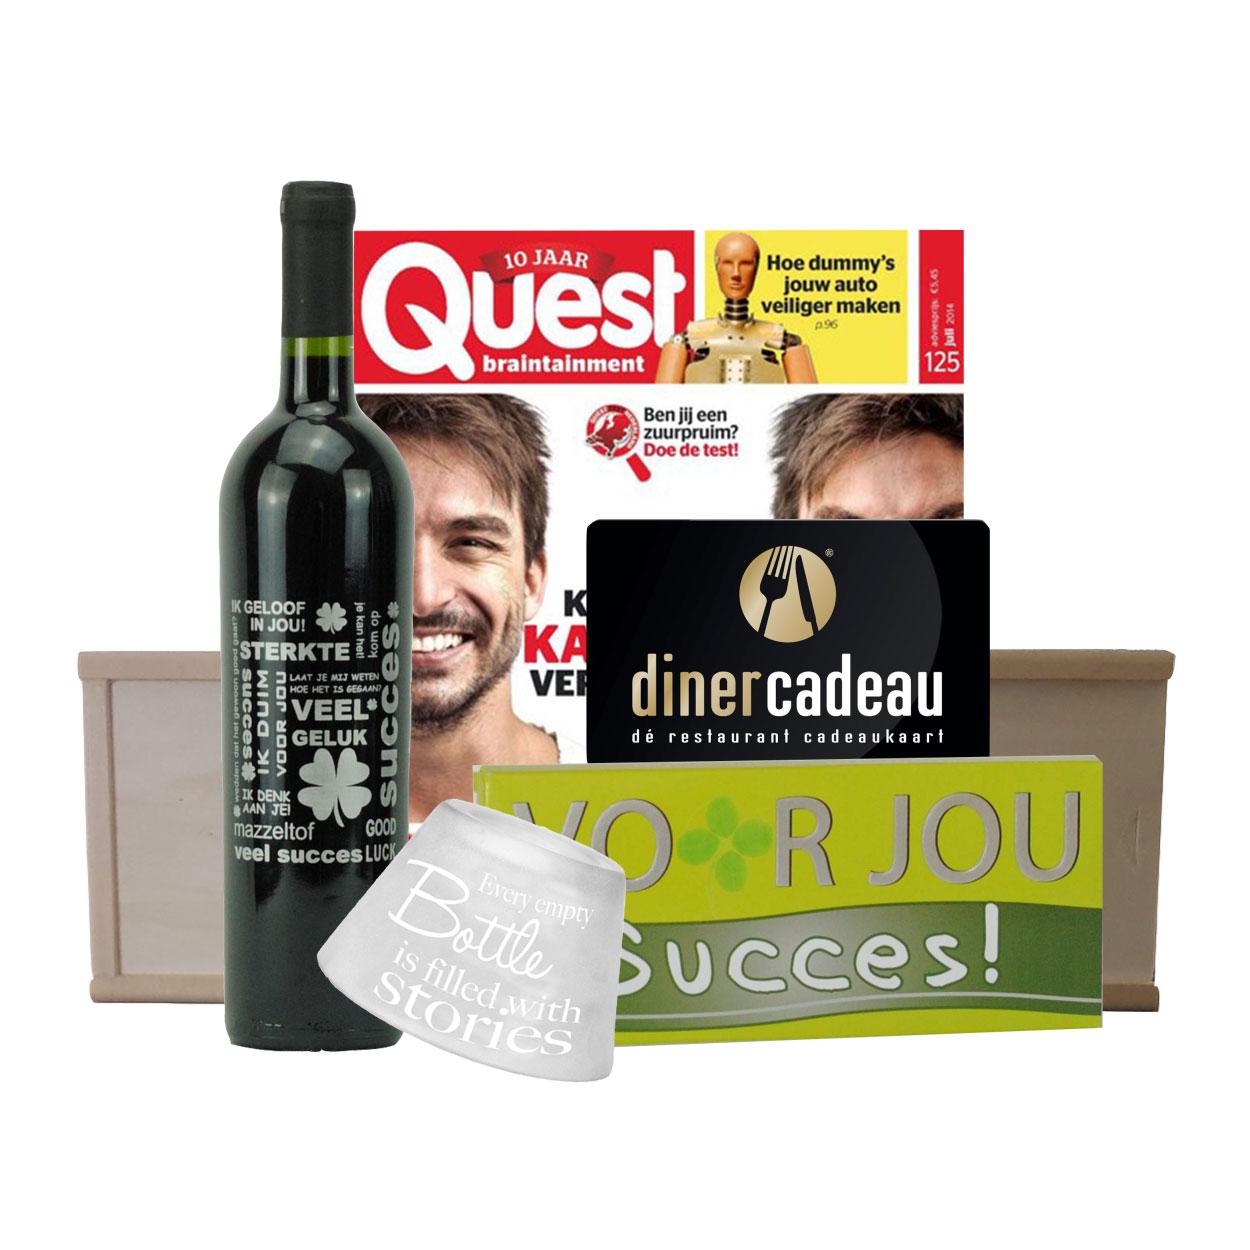 diner cadeaukaart 15 euro quest pakket. Black Bedroom Furniture Sets. Home Design Ideas